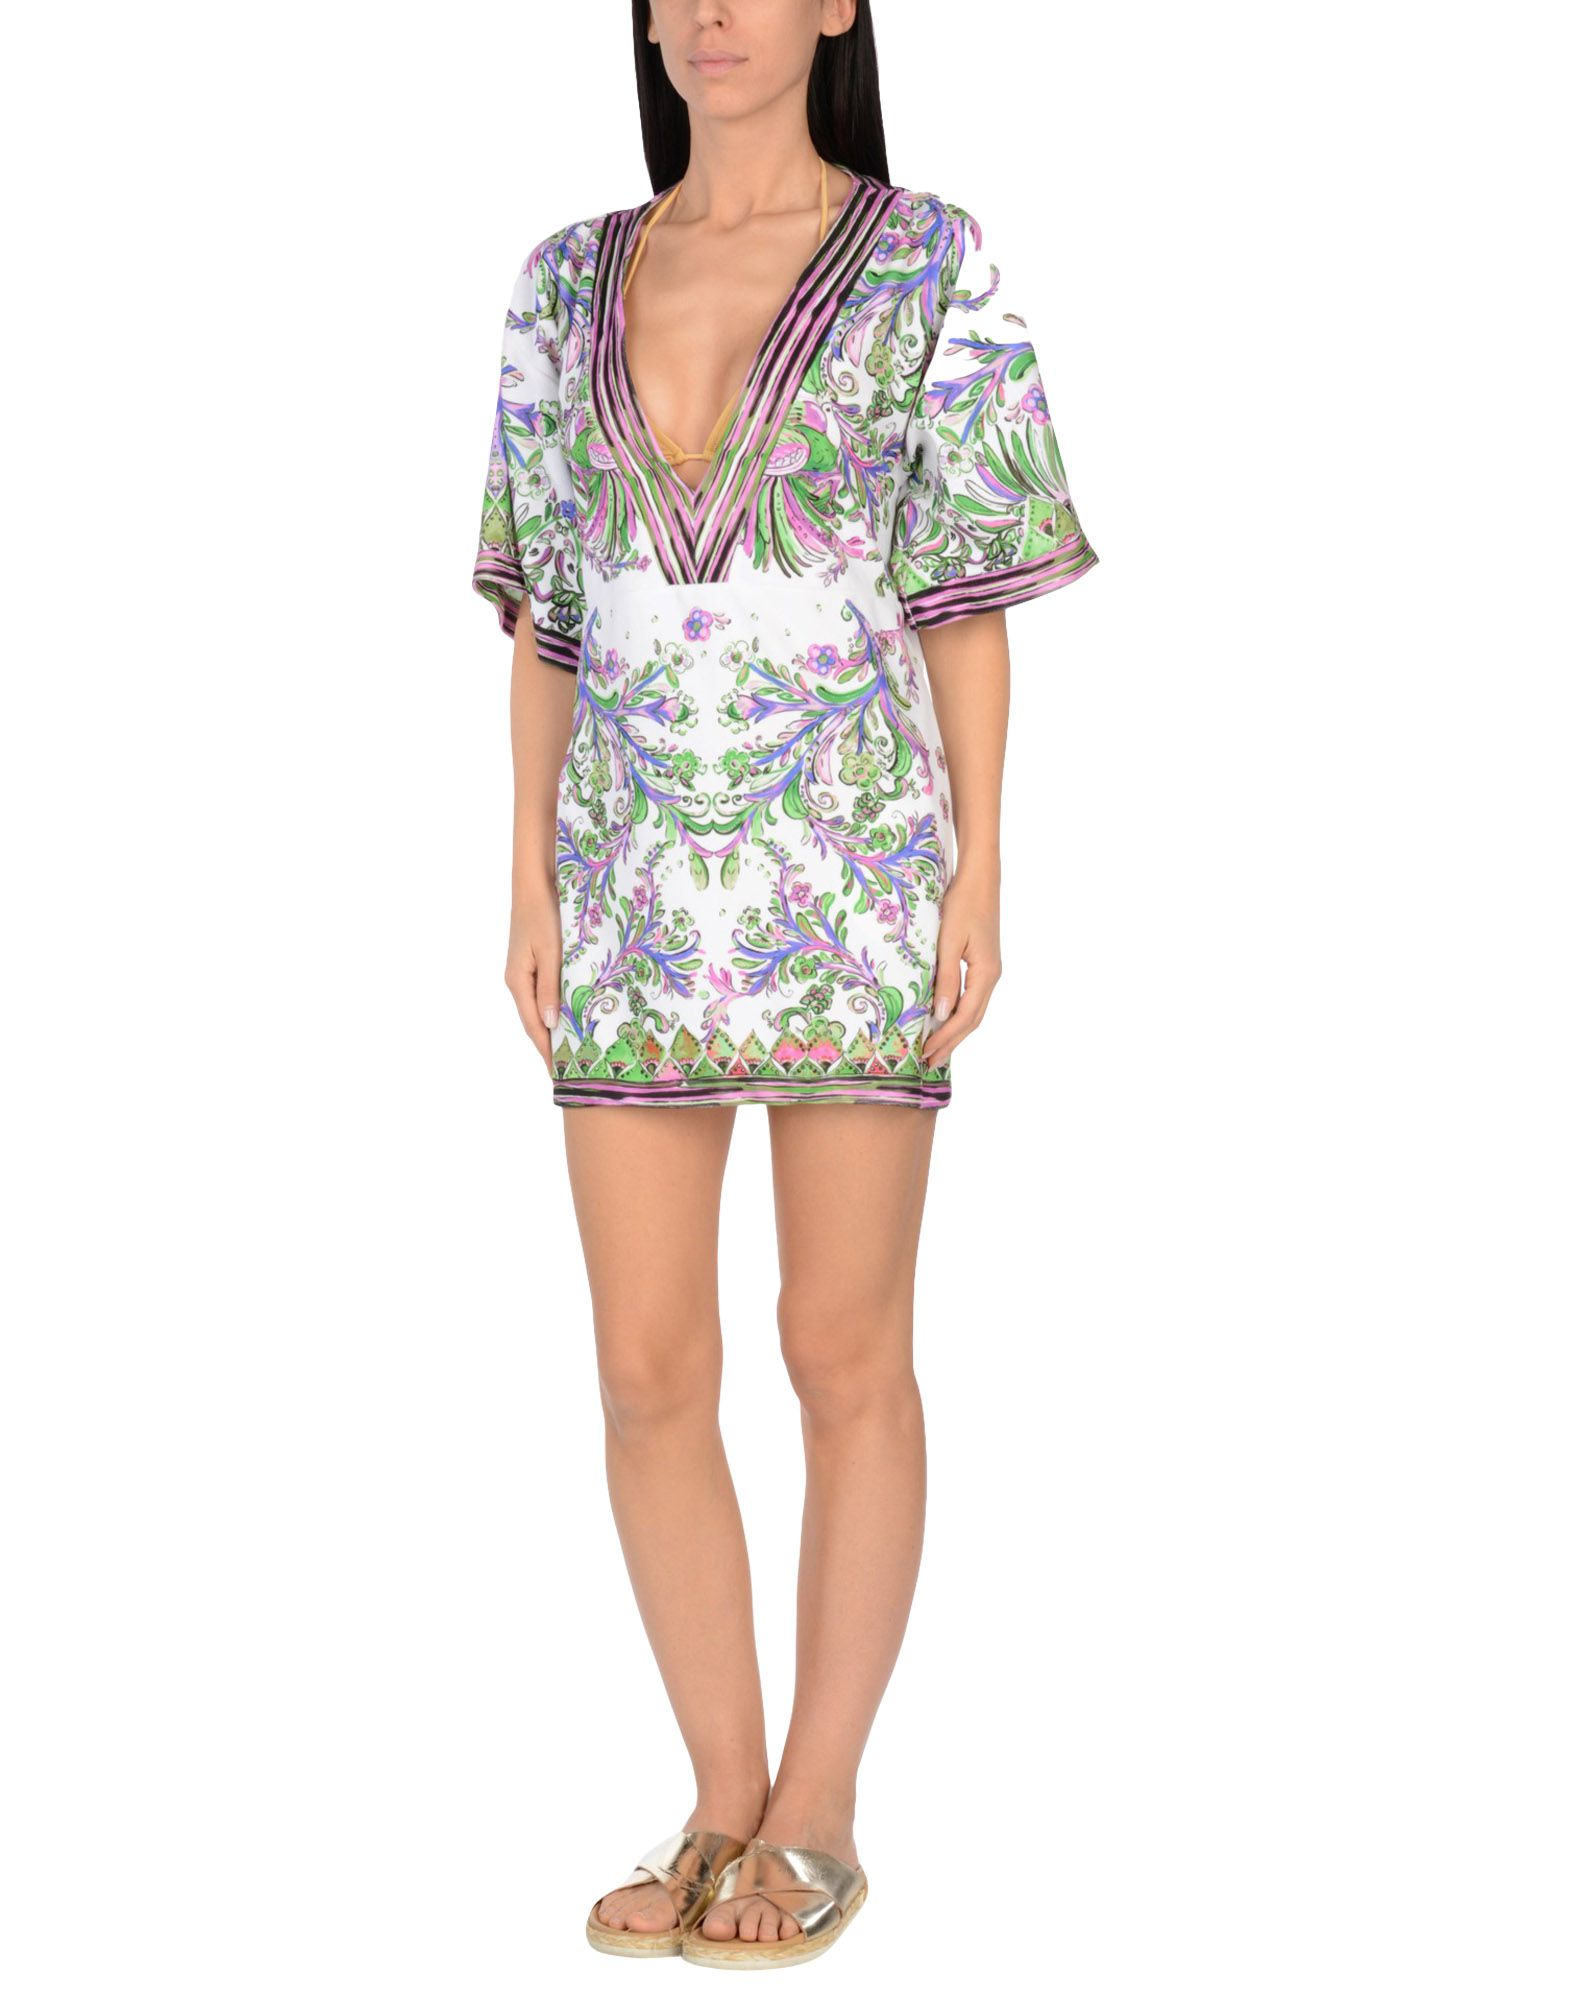 Copricostume Roberto Cavalli Beachwear Donna - Acquista online su UBKKVAQvzN